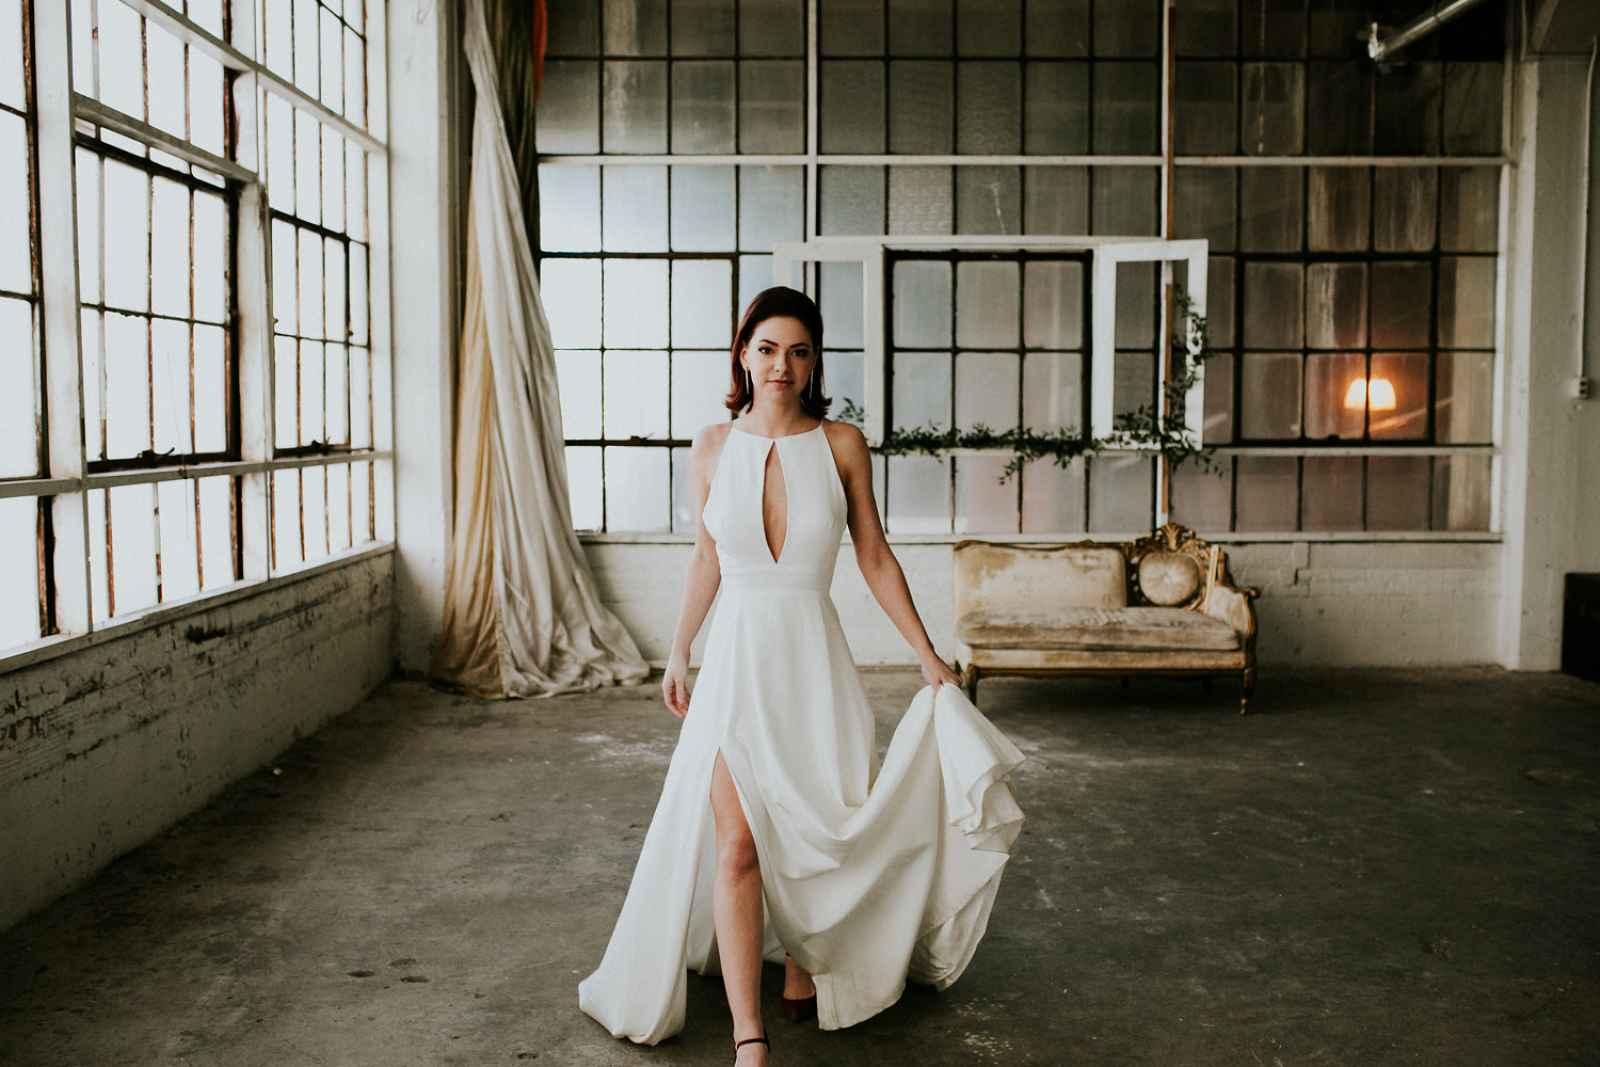 cb13620caa44 25 Bridal Salons You MUST Visit | WeddingDay Magazine